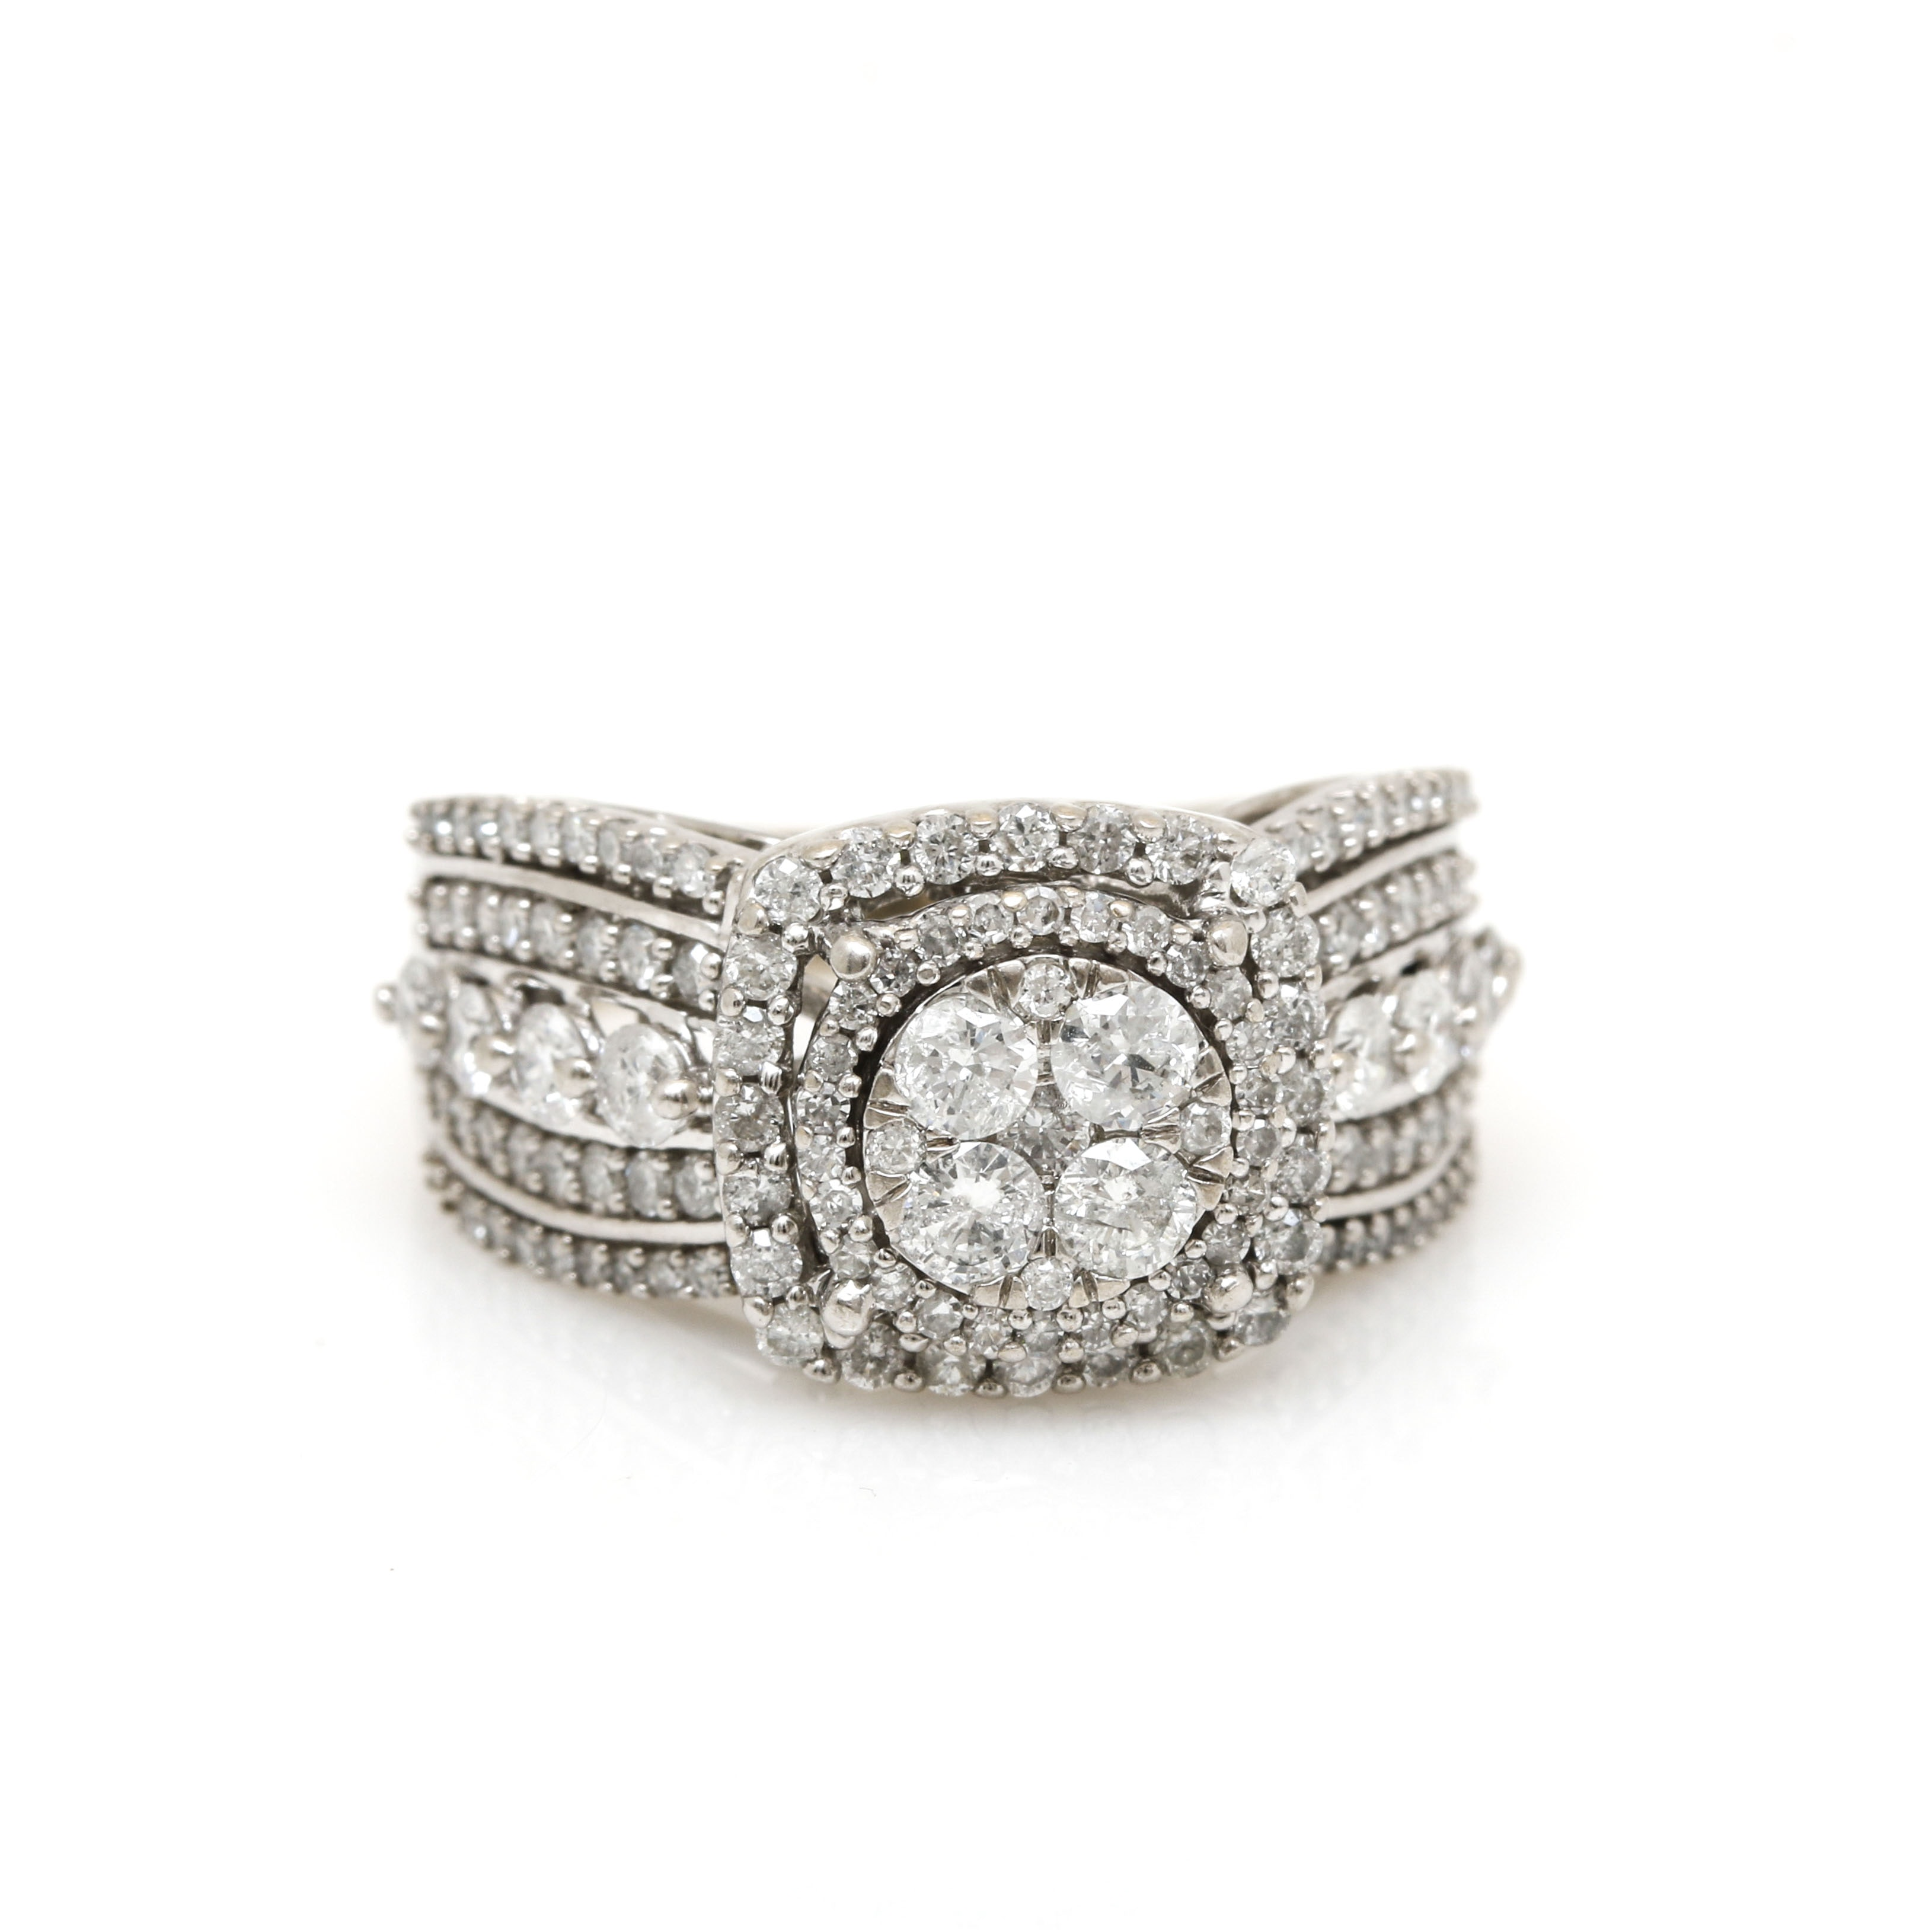 10K White Gold 1.84 CTW Diamond Illusion Set Ring